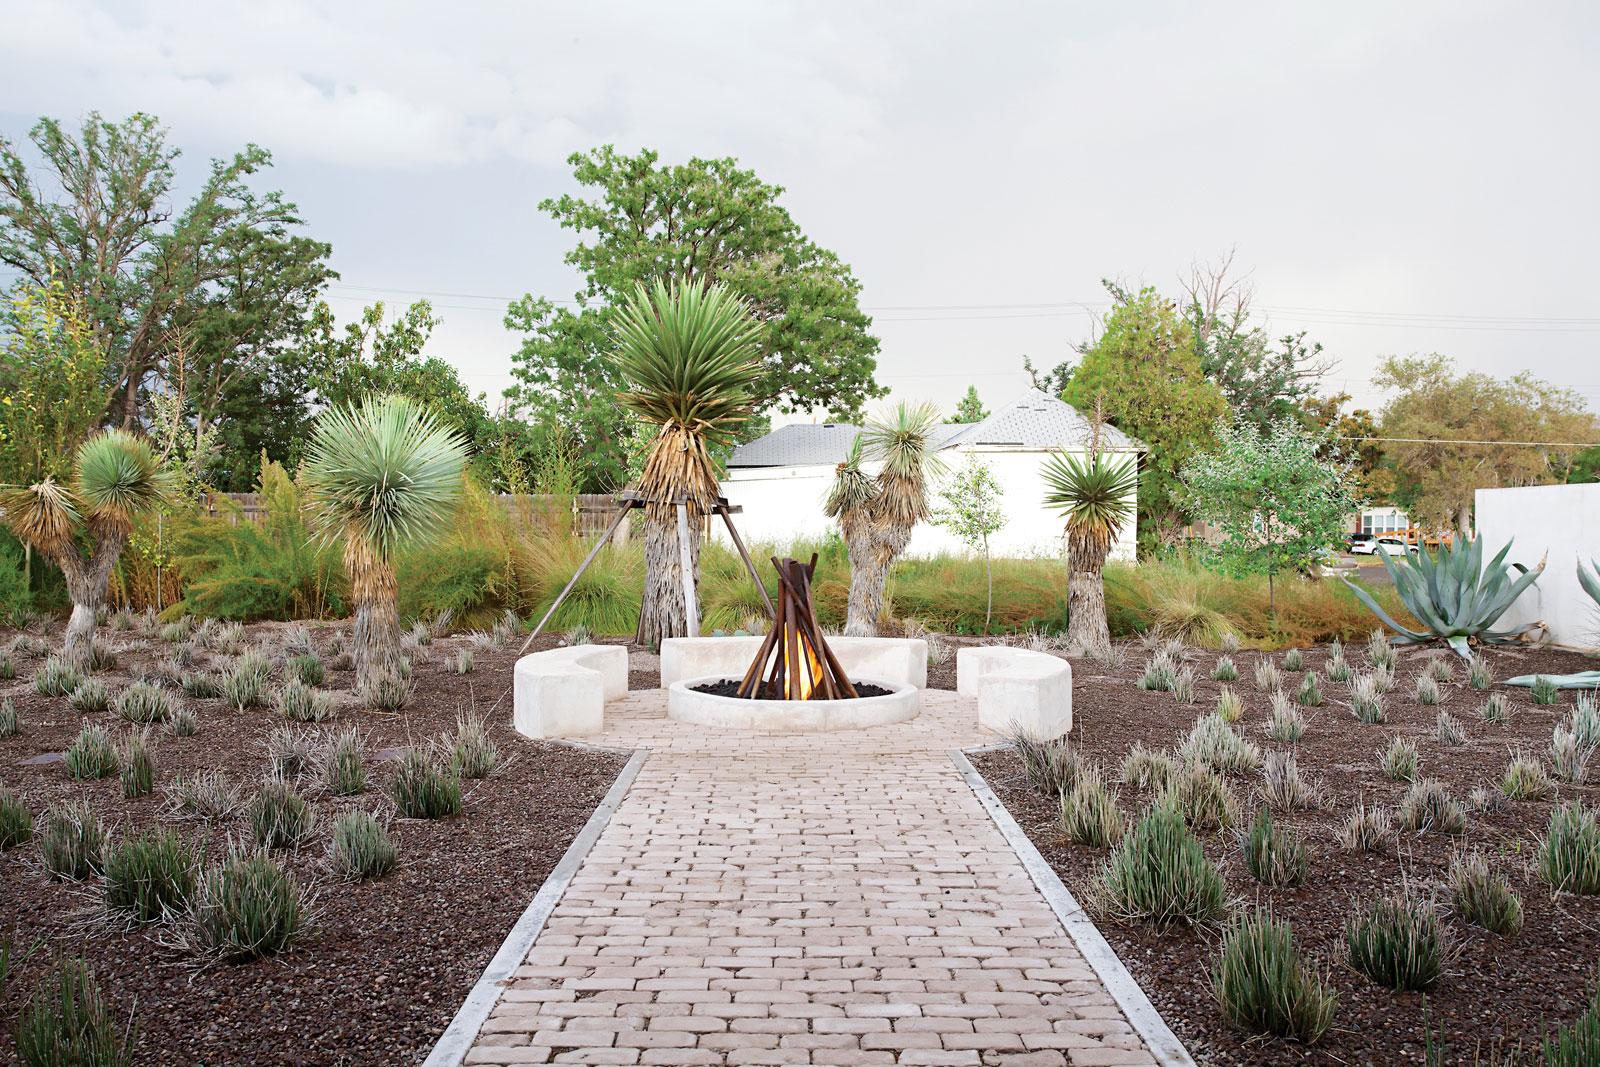 Architects barbara hill design location marfa texas usa photographs misty keasler for dwell